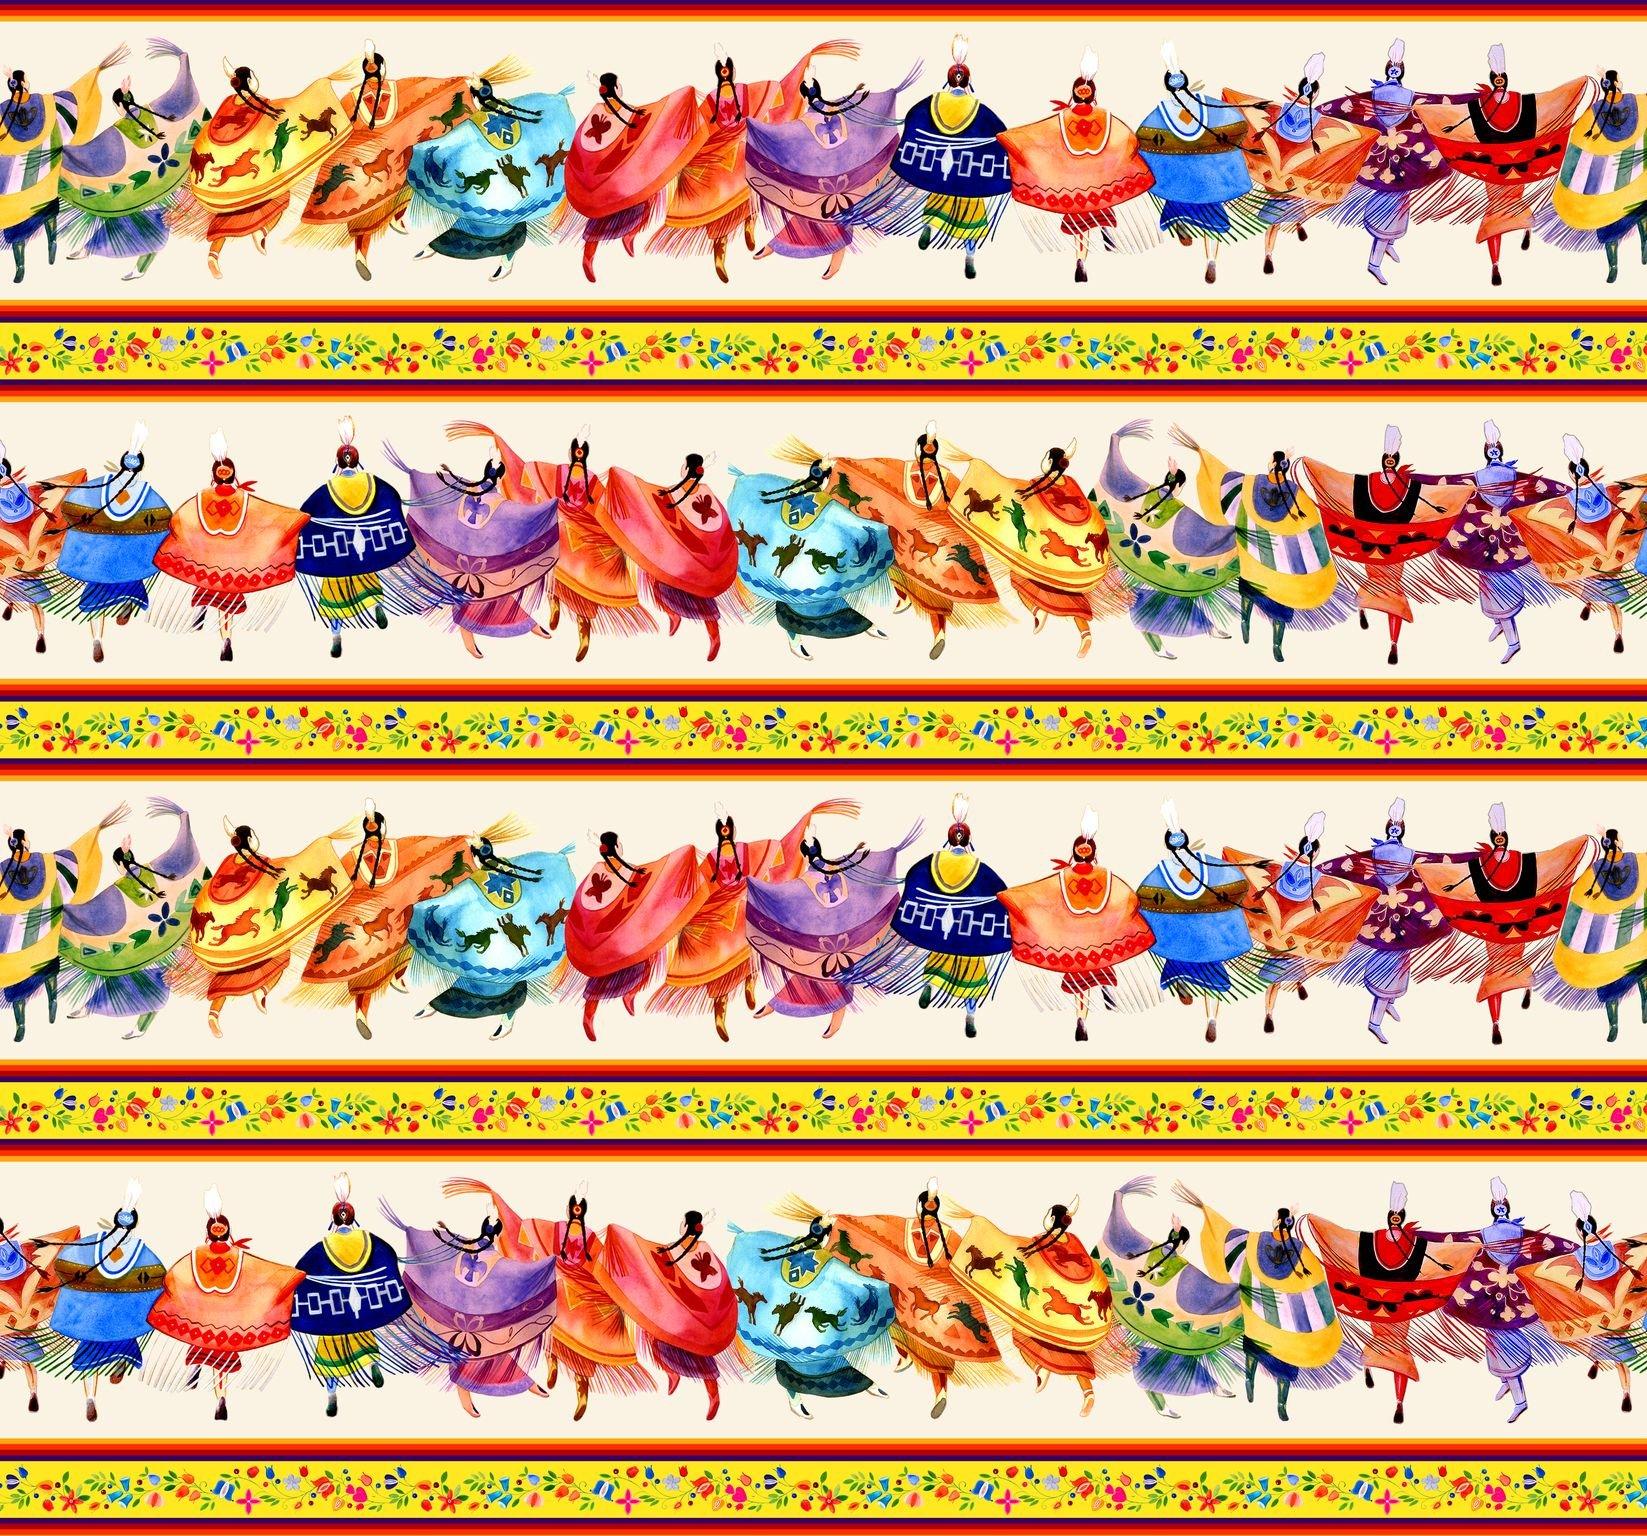 ES-Shawl Dancers 32000 Cream - Border Stripe